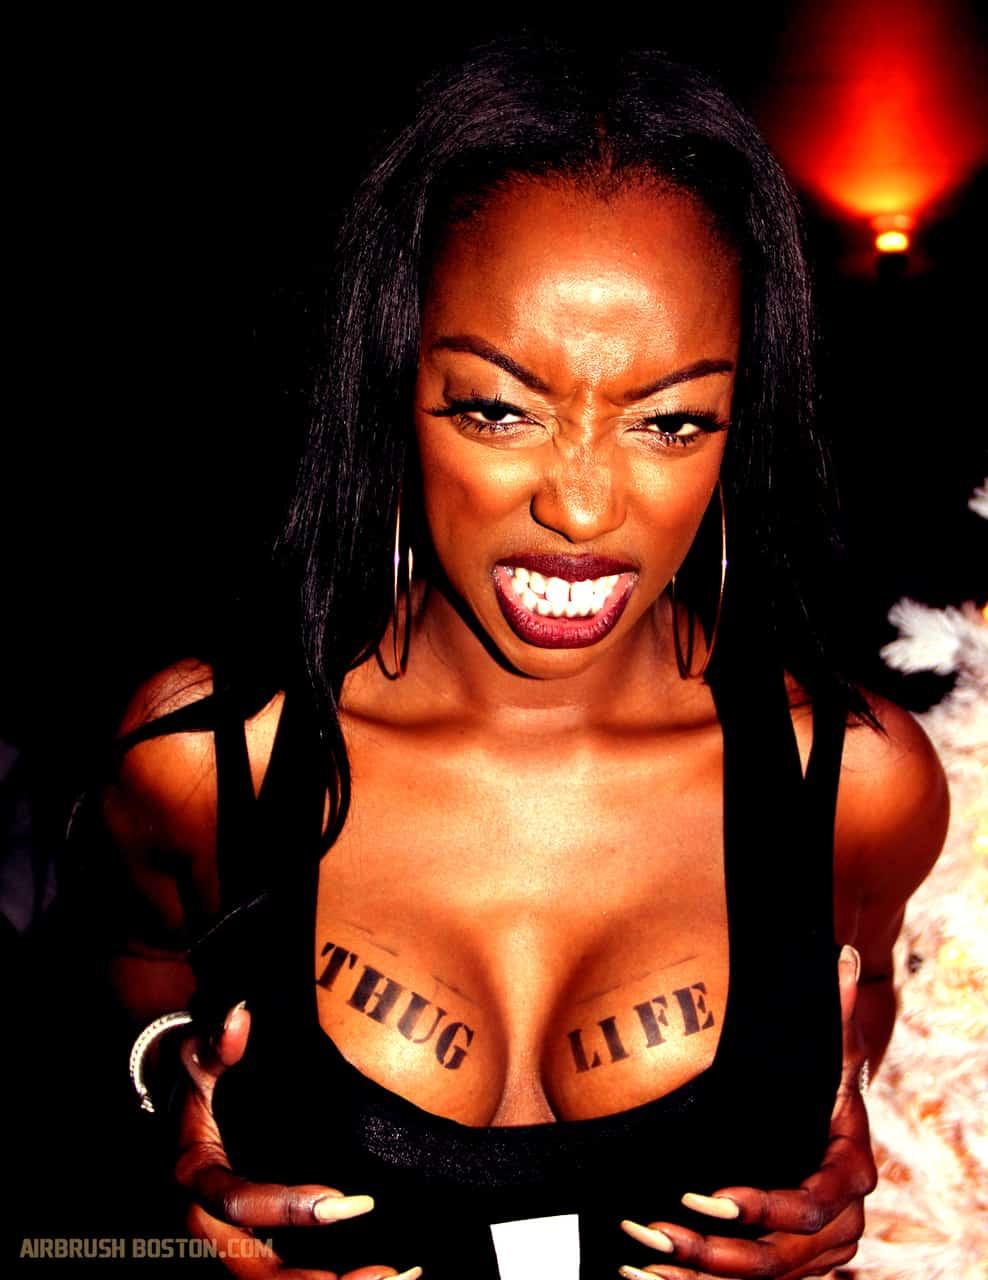 thug-life-airbrush-full